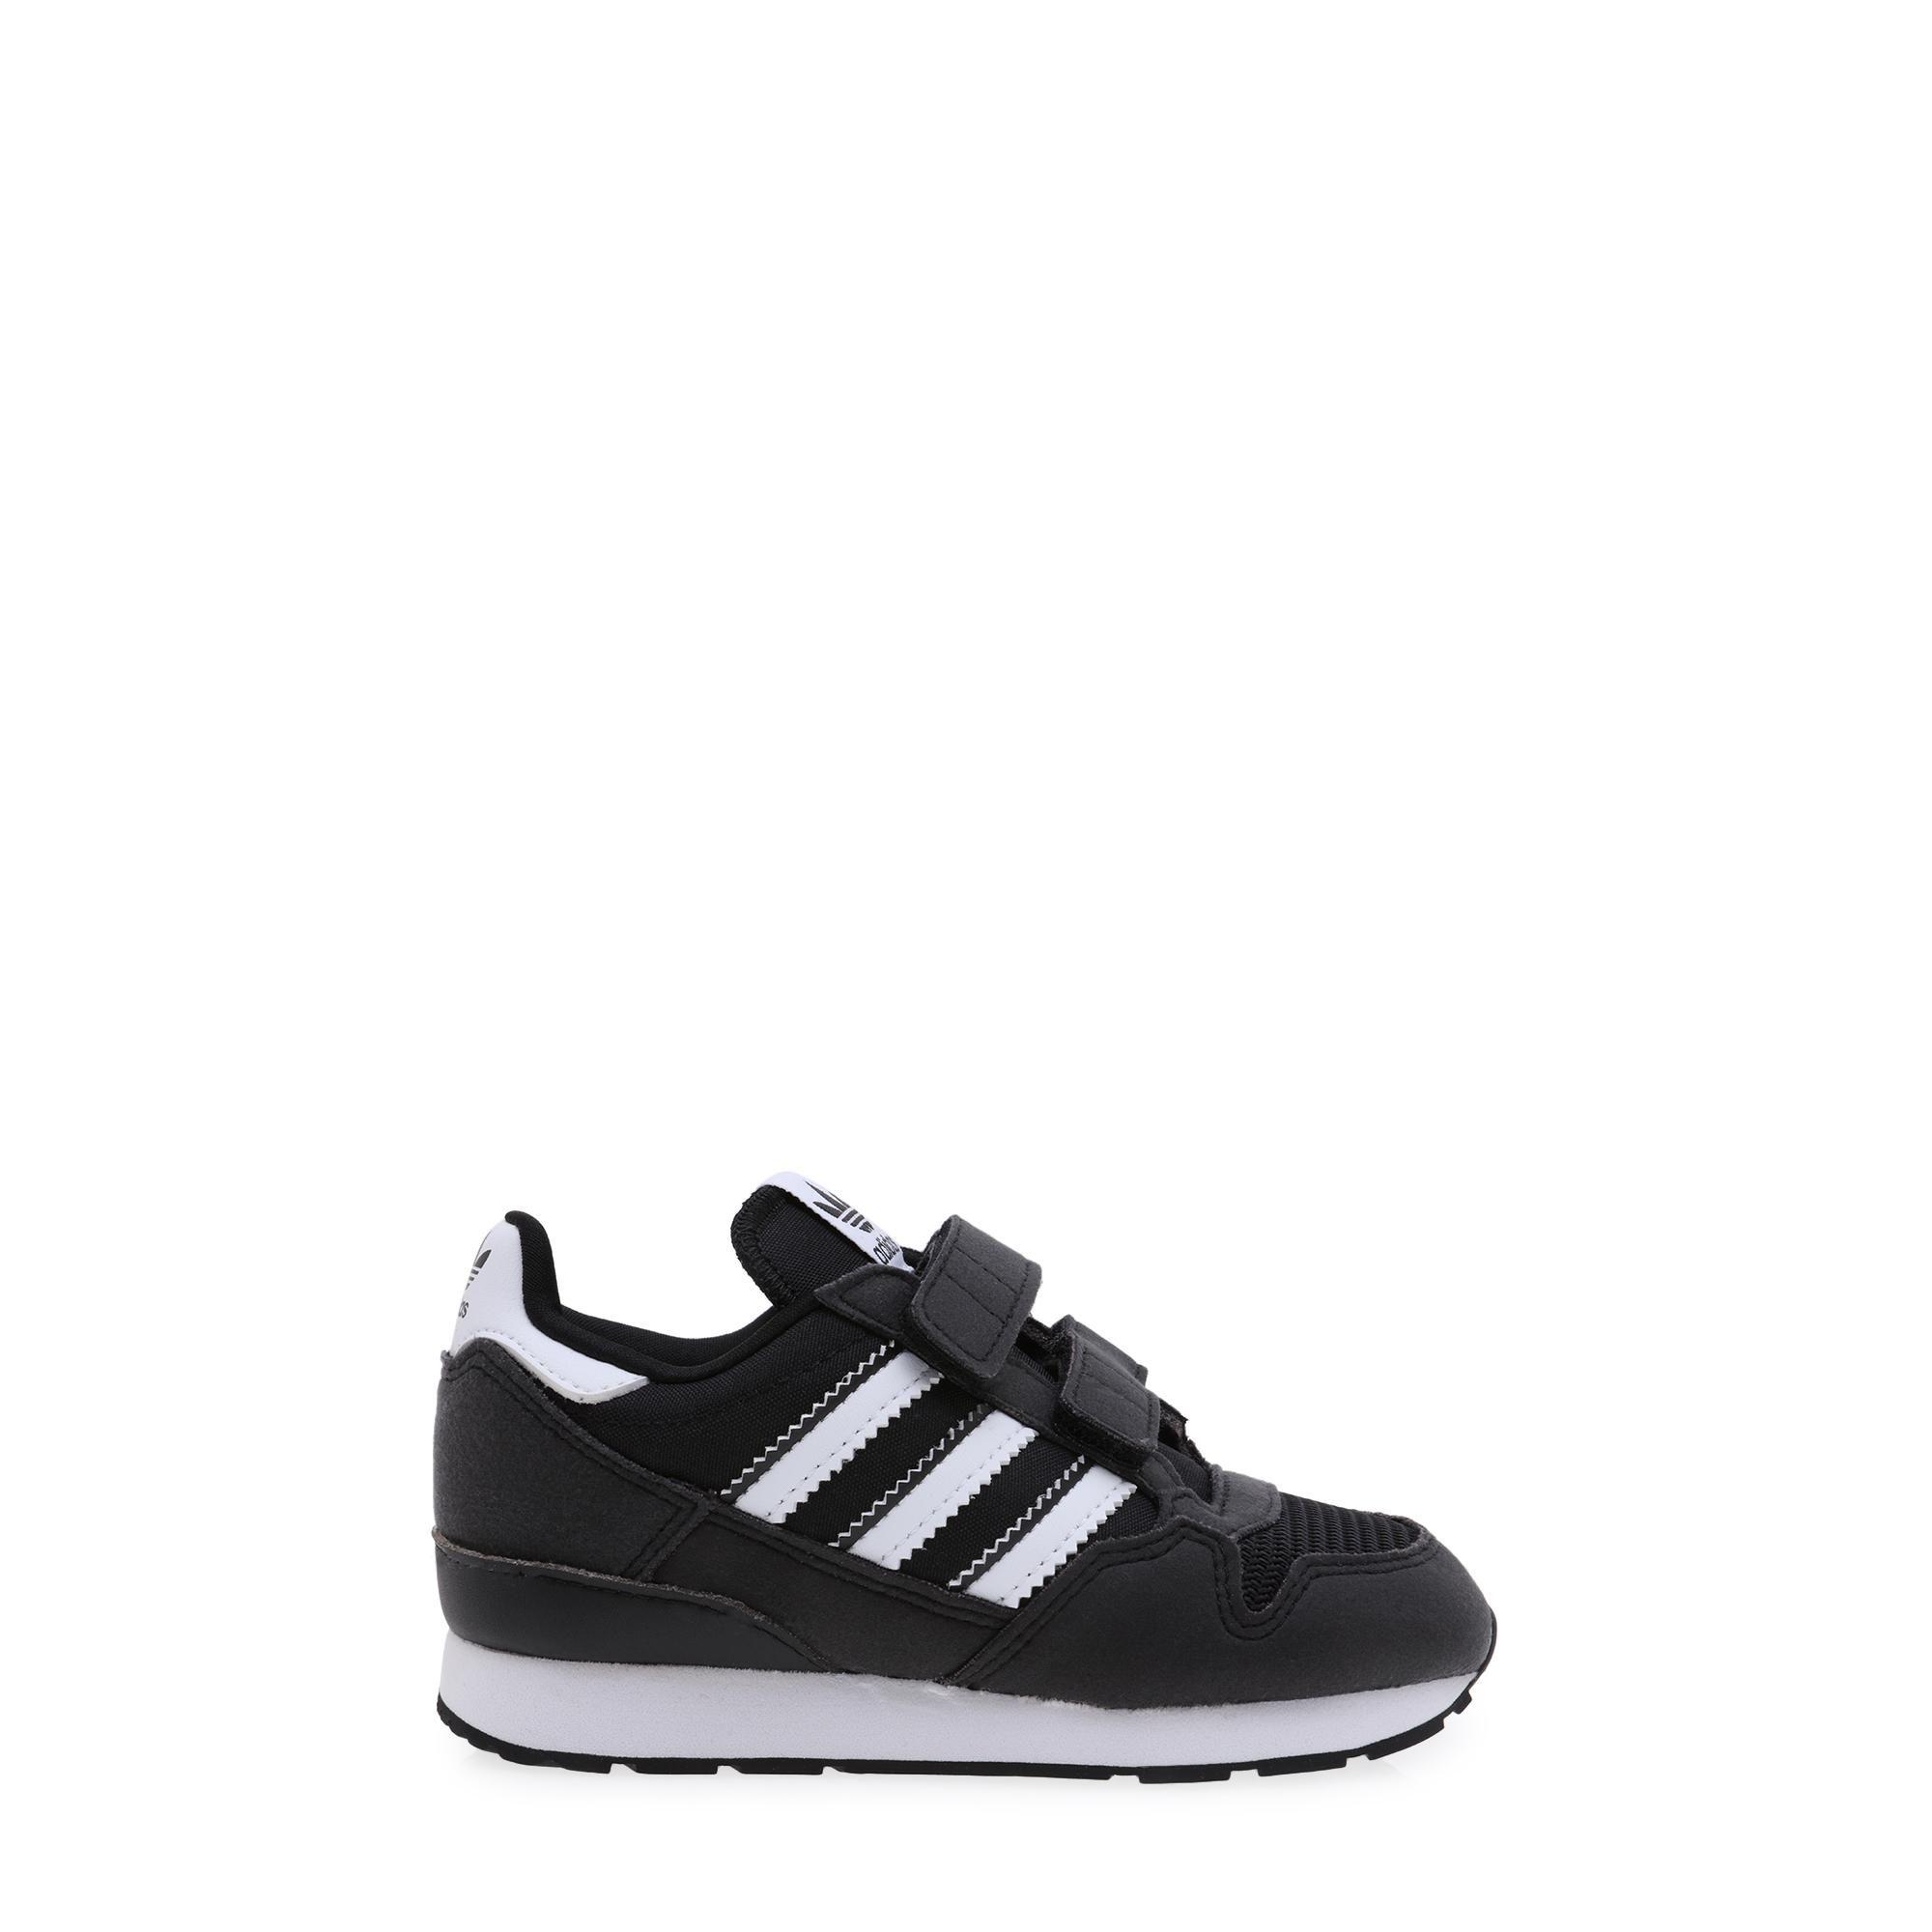 ZX 500 sneakers